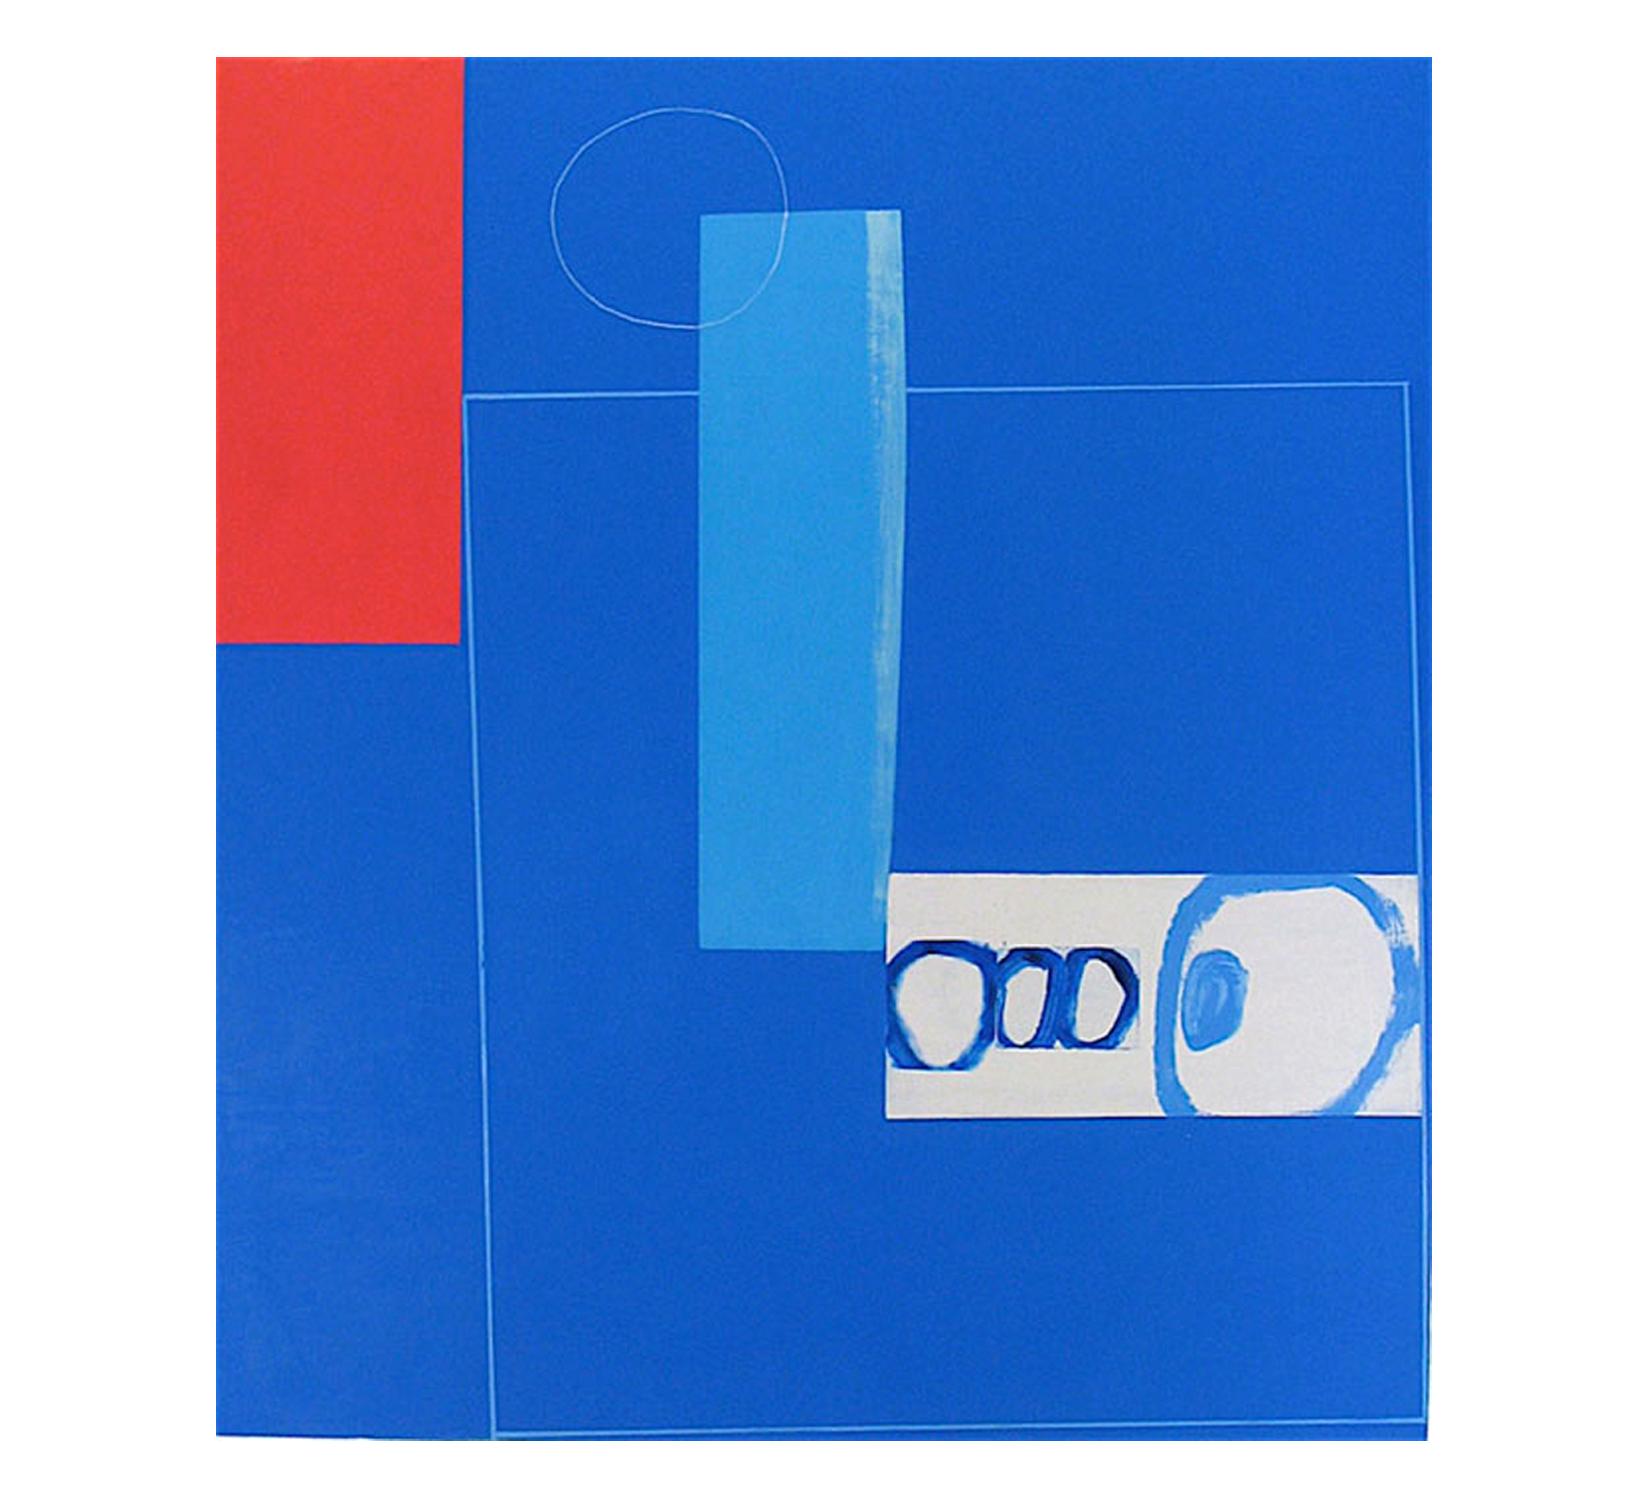 Stephen-Clark-Blue-Hub-SQ.jpg